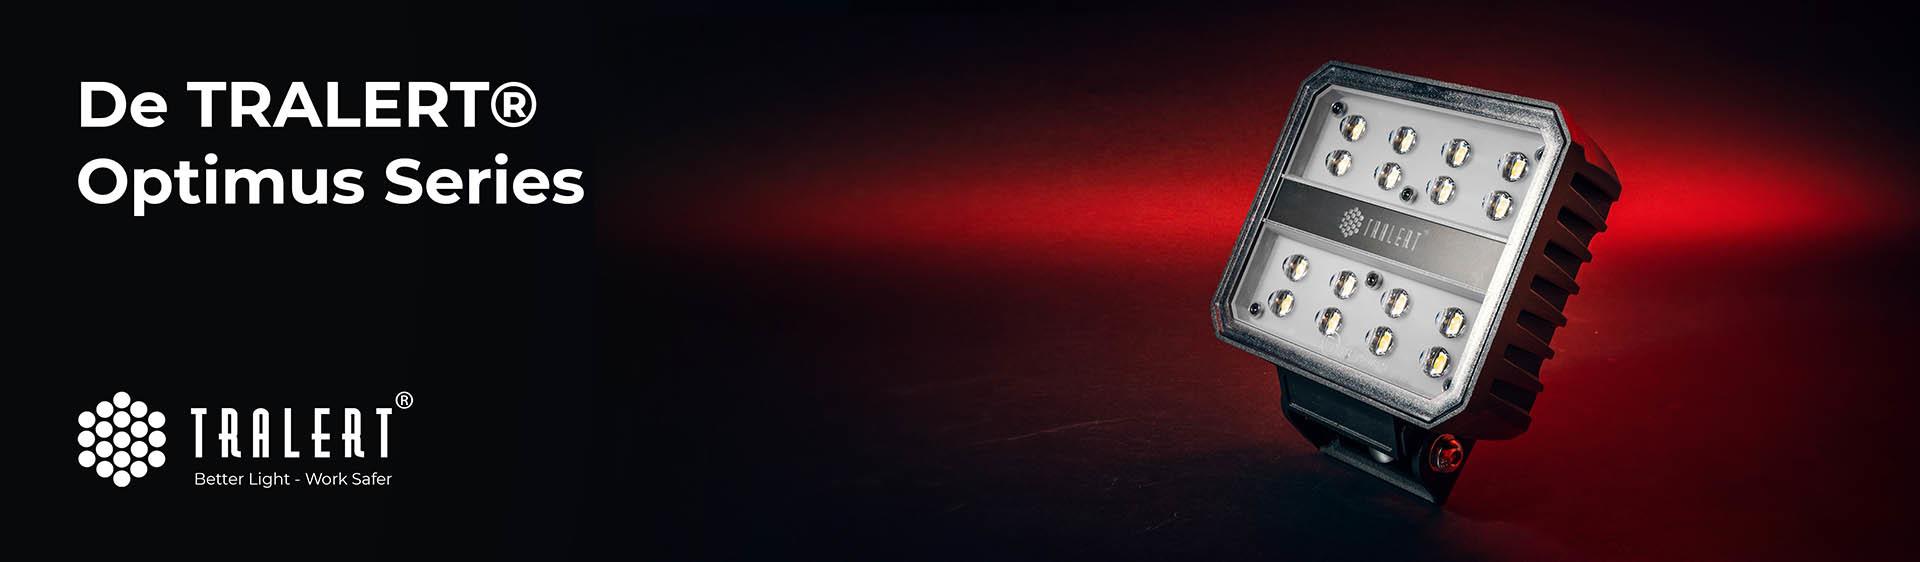 Tralert LED werklampen Optimus Series banner